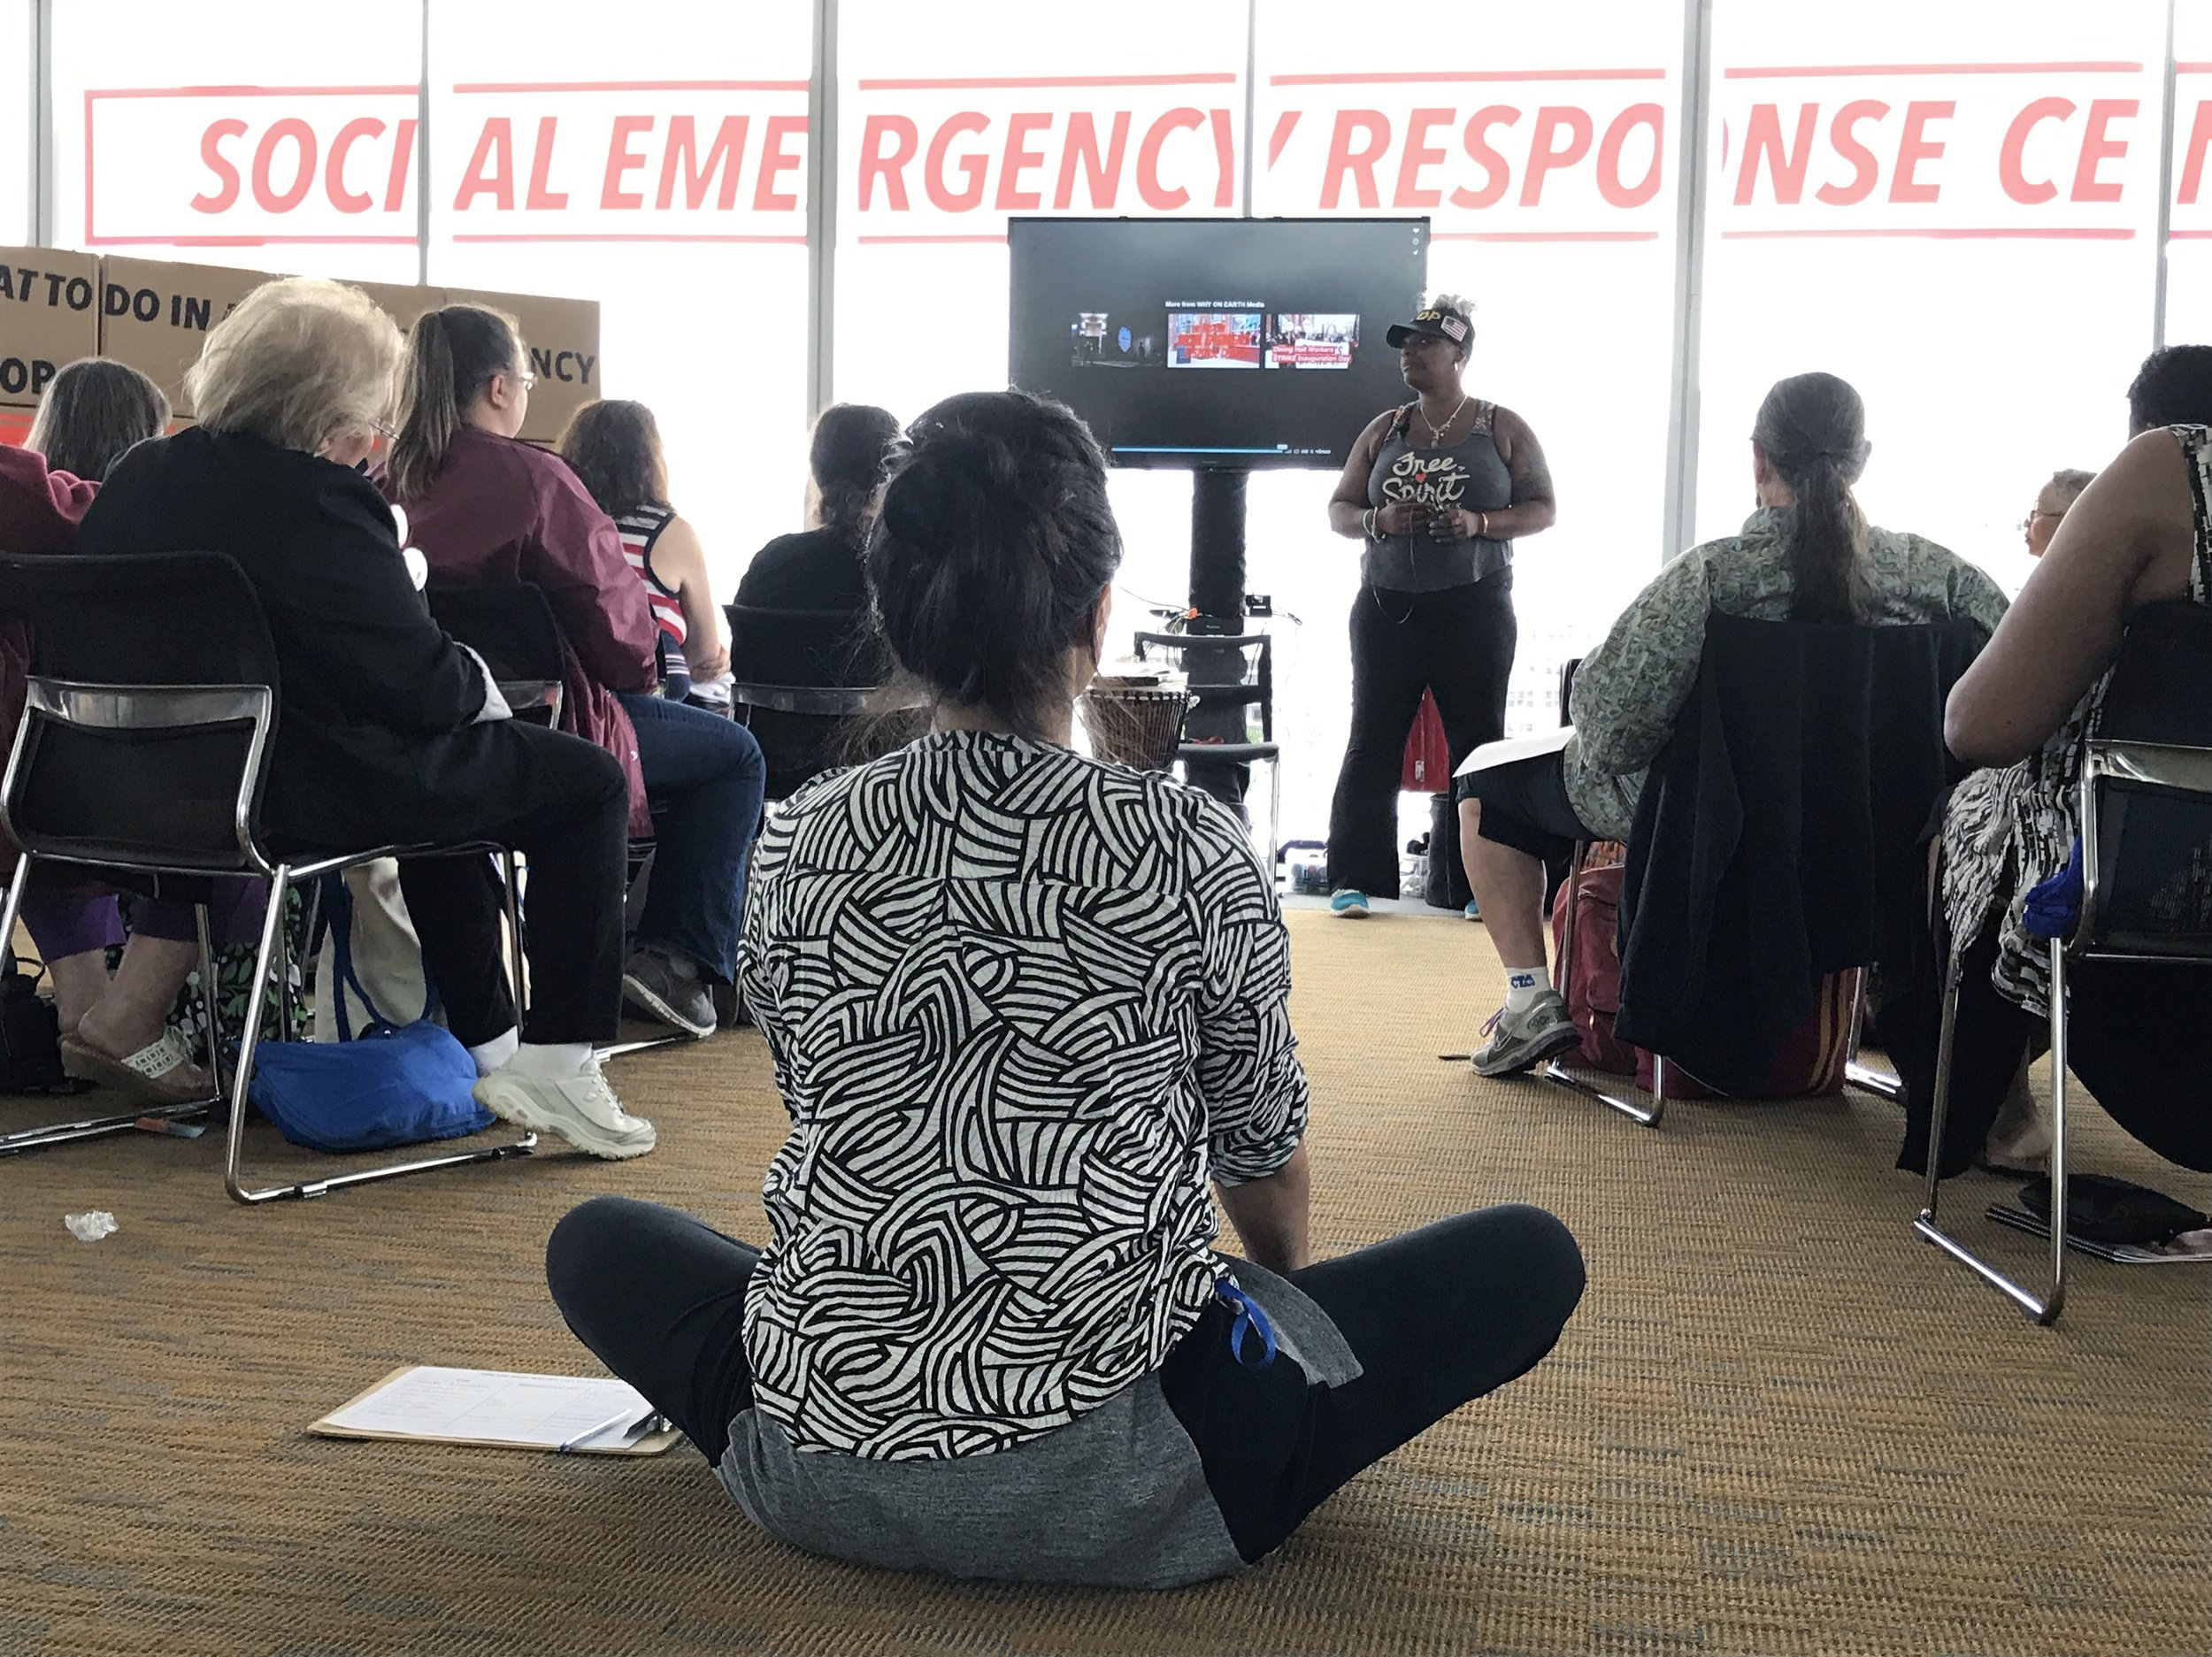 National Education Association Conference - Boston, MA